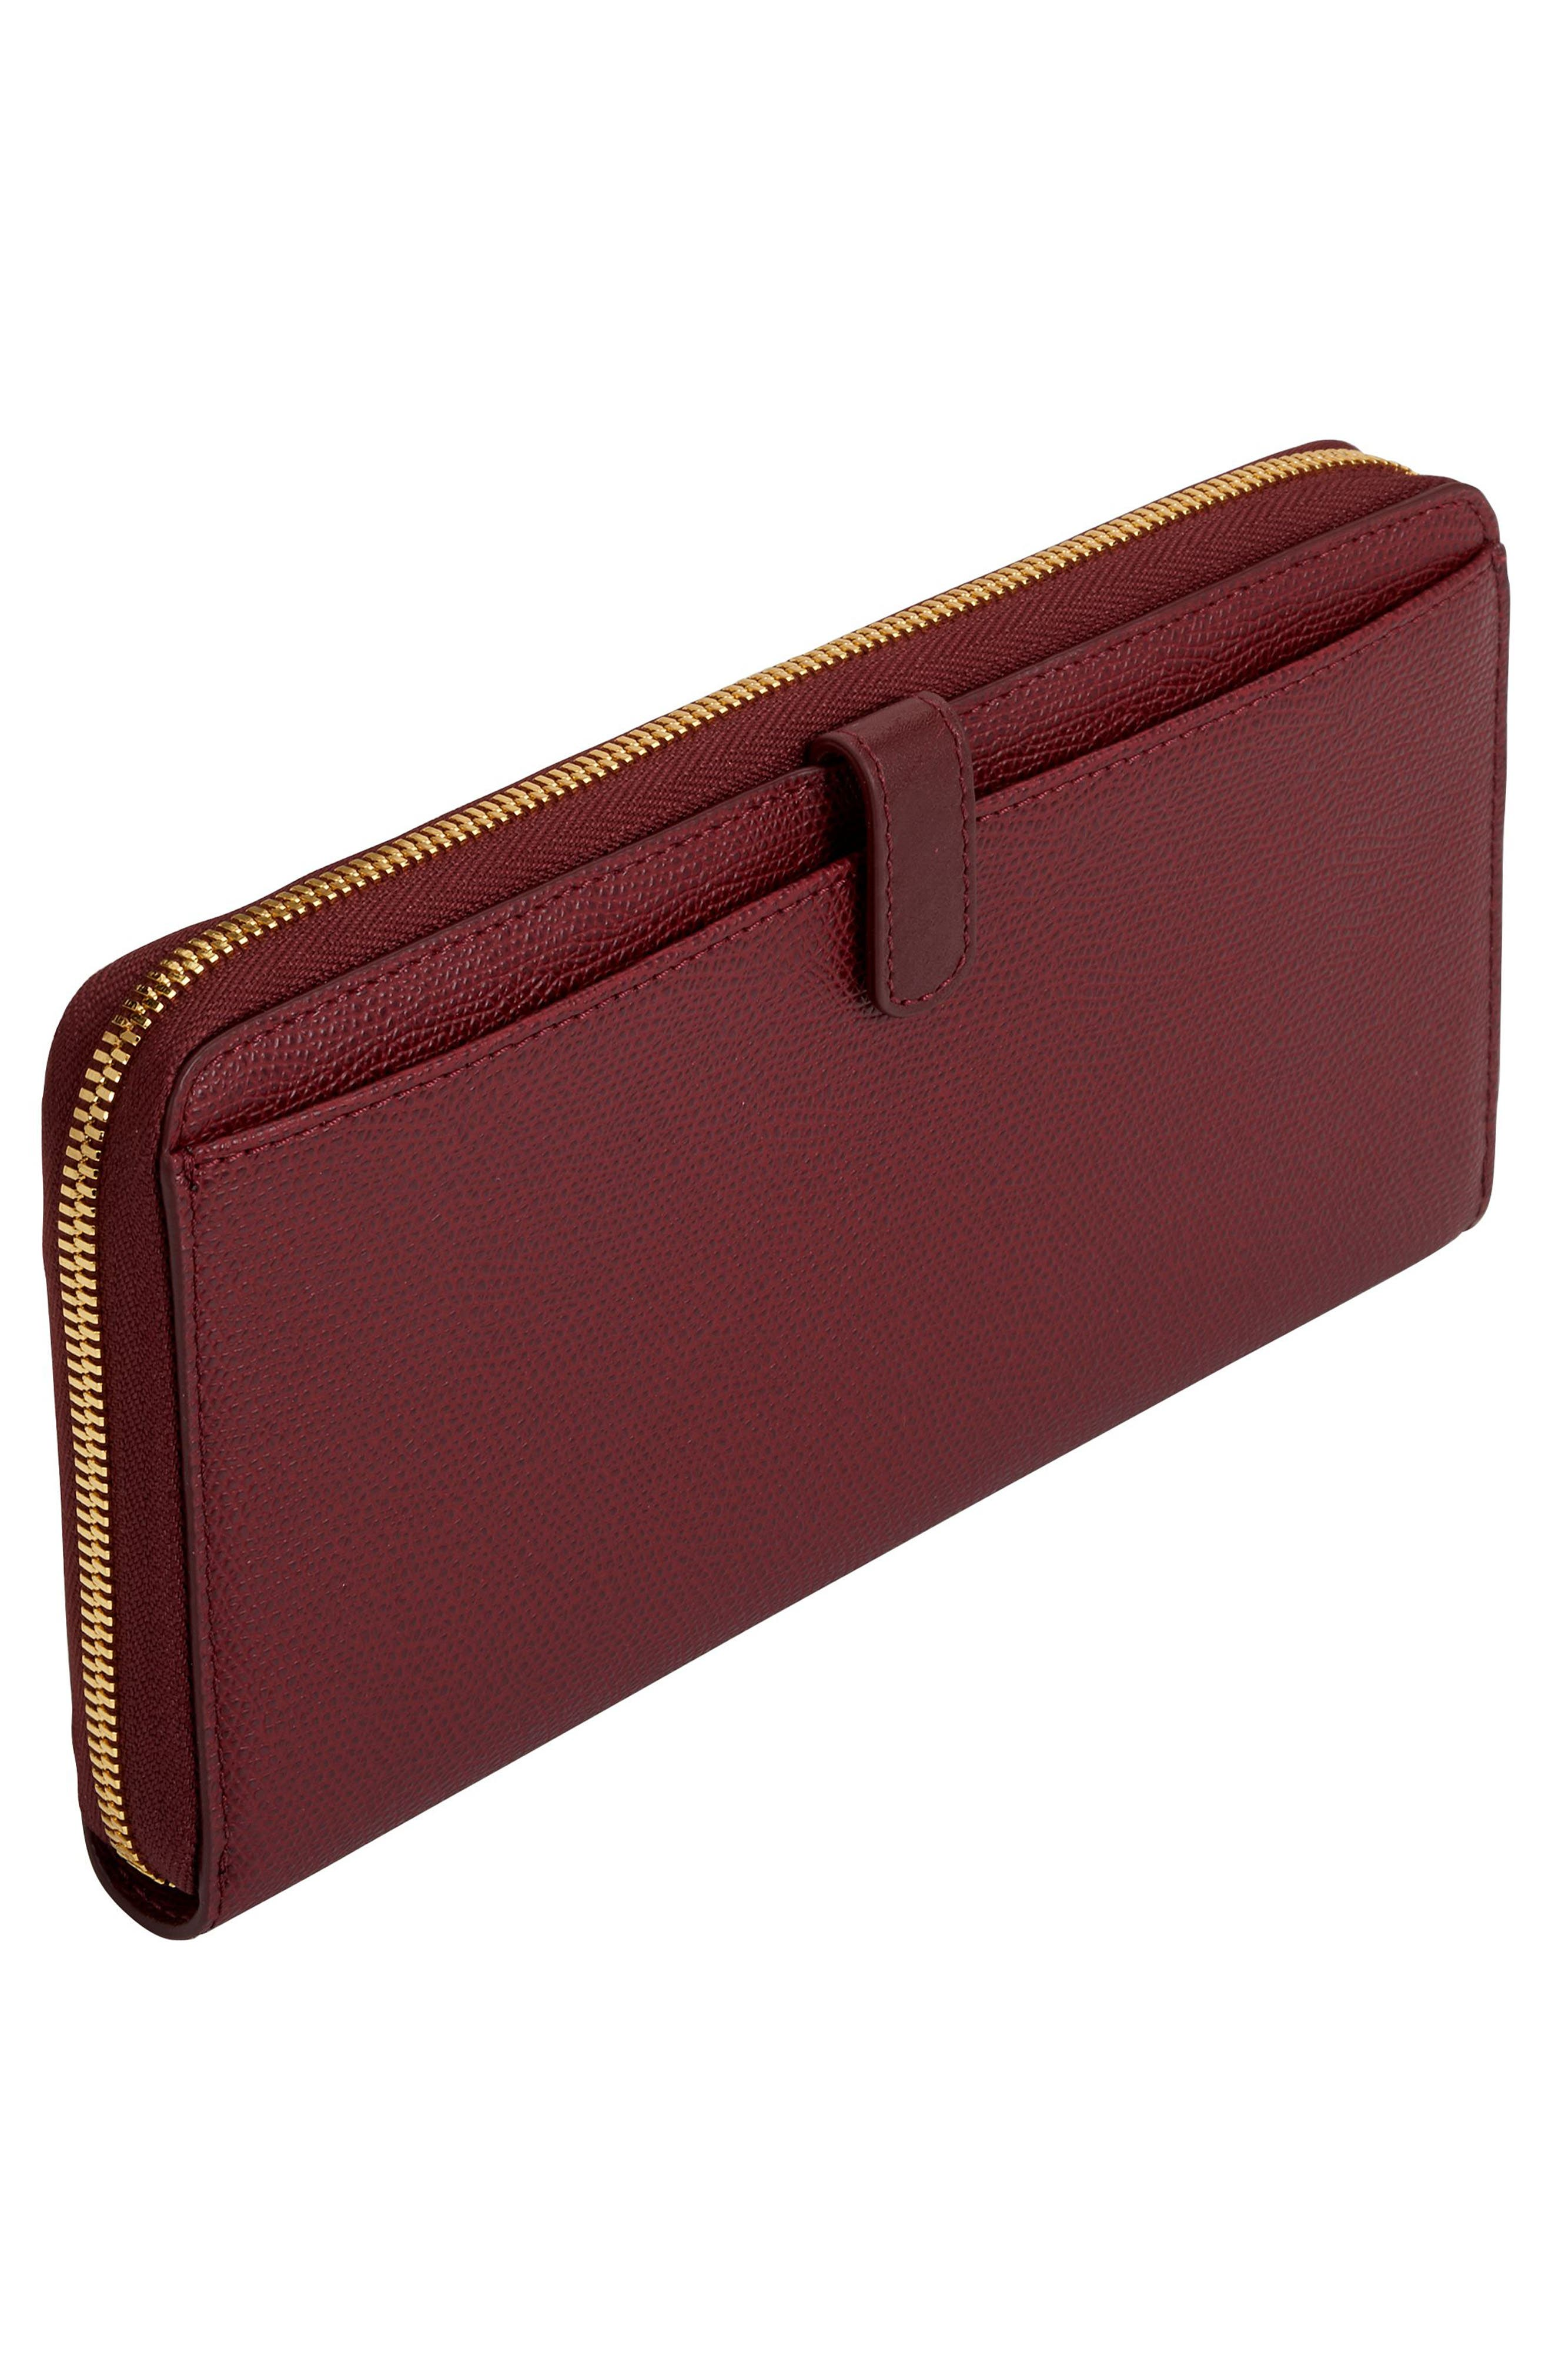 Travel Wallet,                             Alternate thumbnail 3, color,                             Burgundy